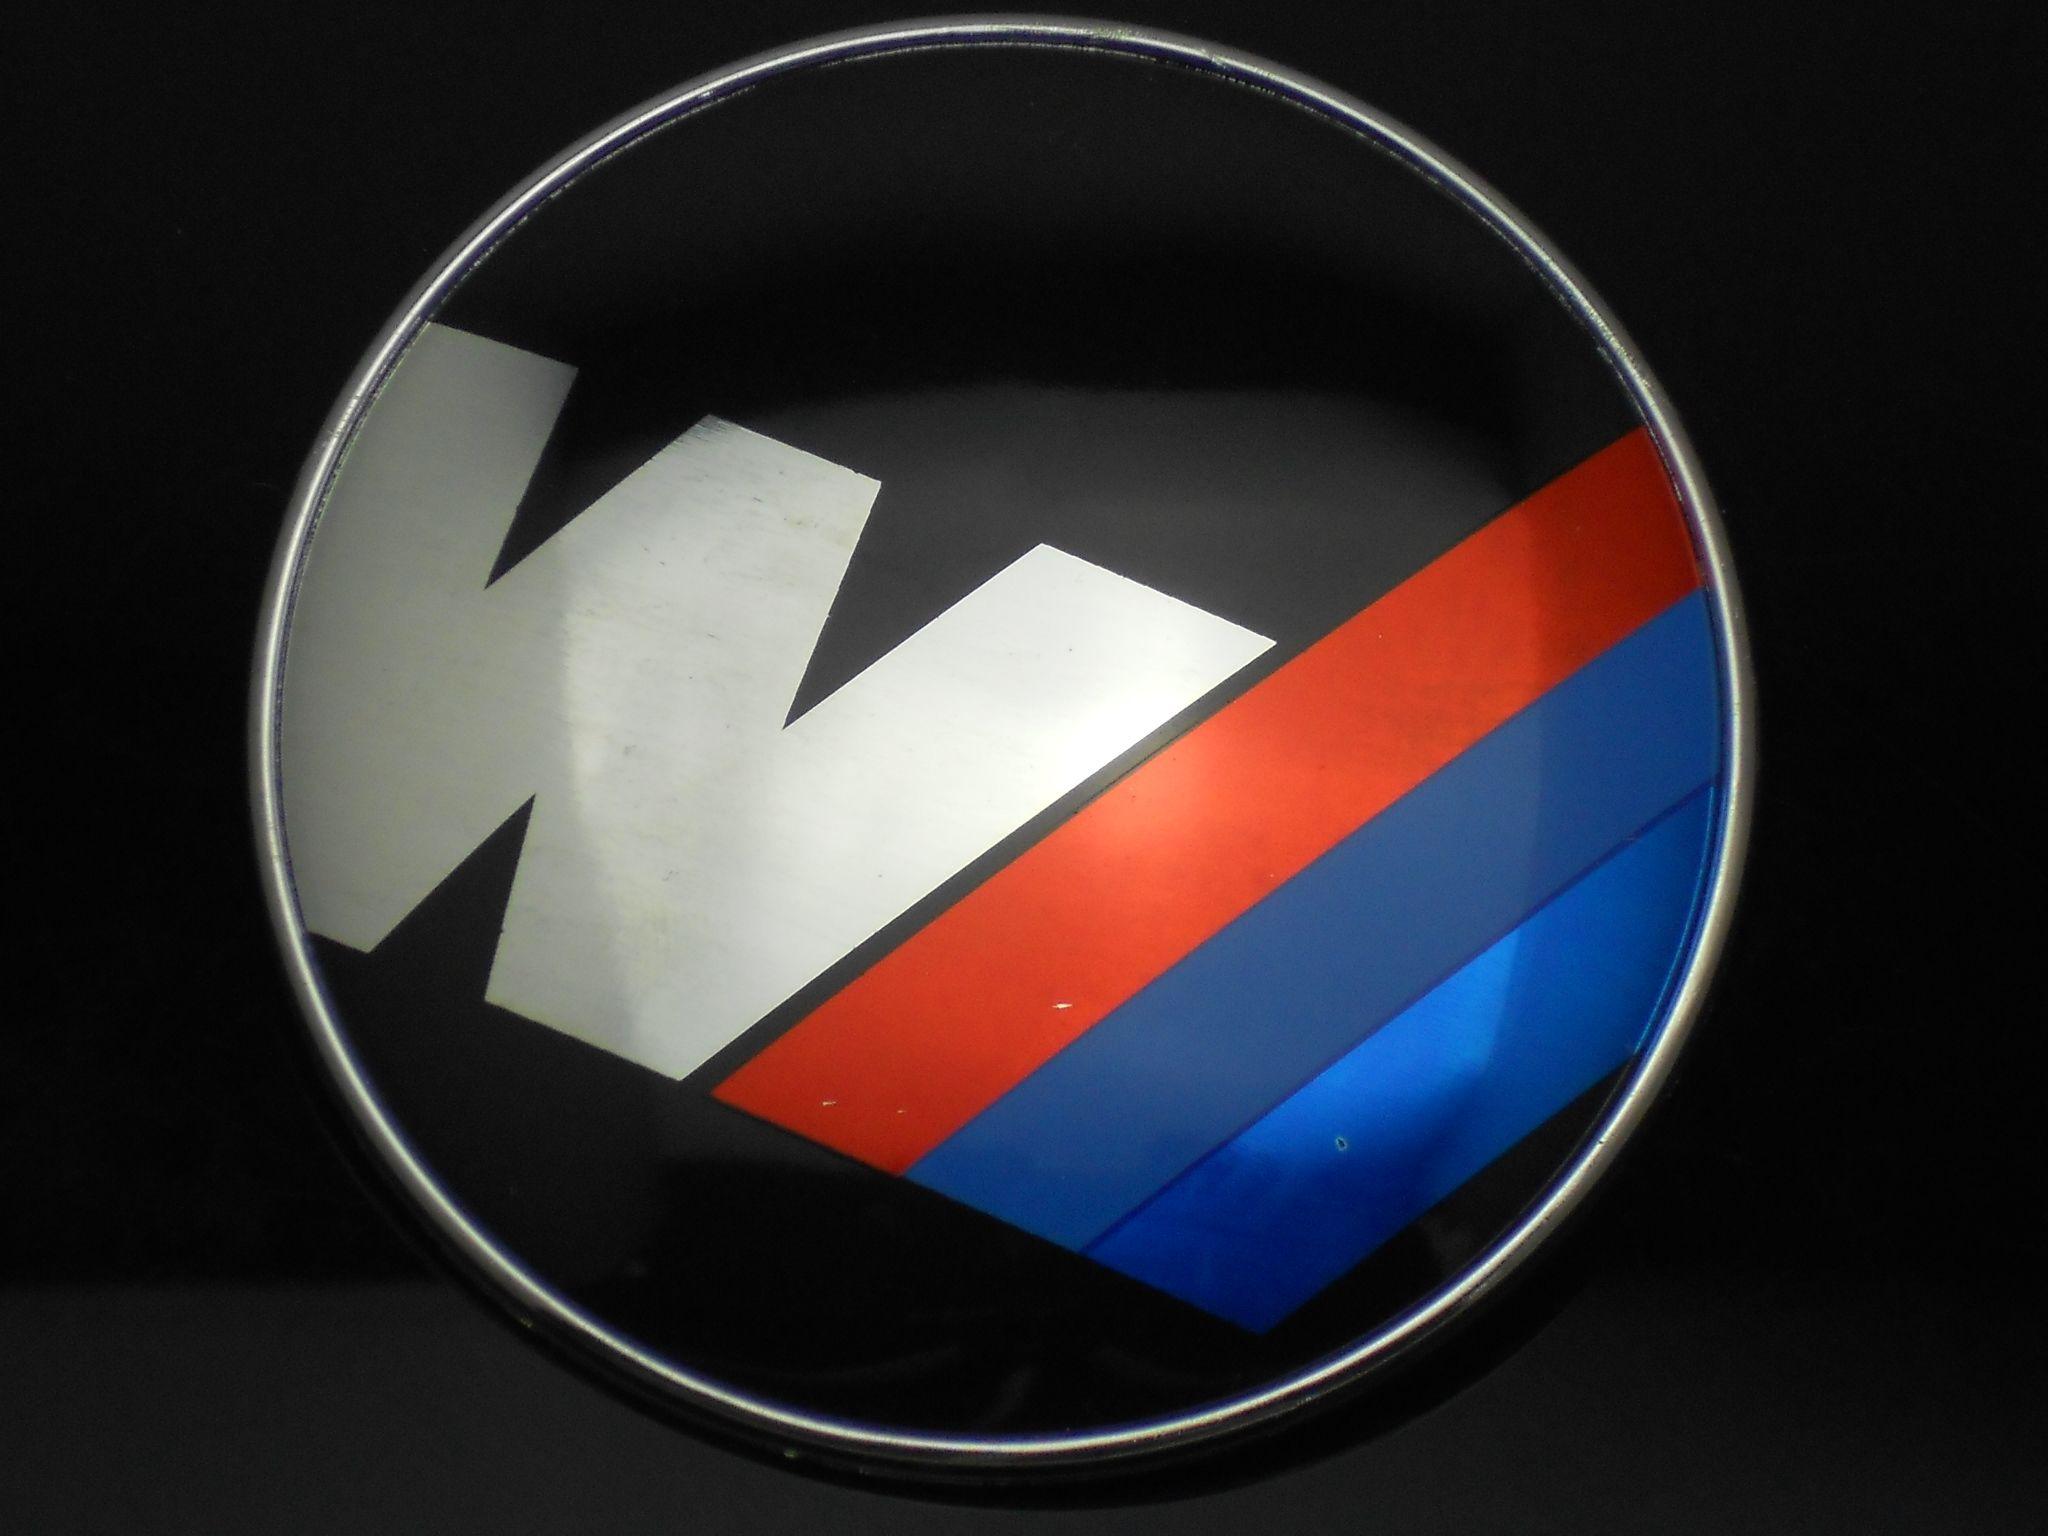 2021 Car Badges M Tech Sport Power Front Rear Wheel Caps Car Emblem For Bmw 82mm 74mm 68mm From Eforcar 2 82 Dhgate Com